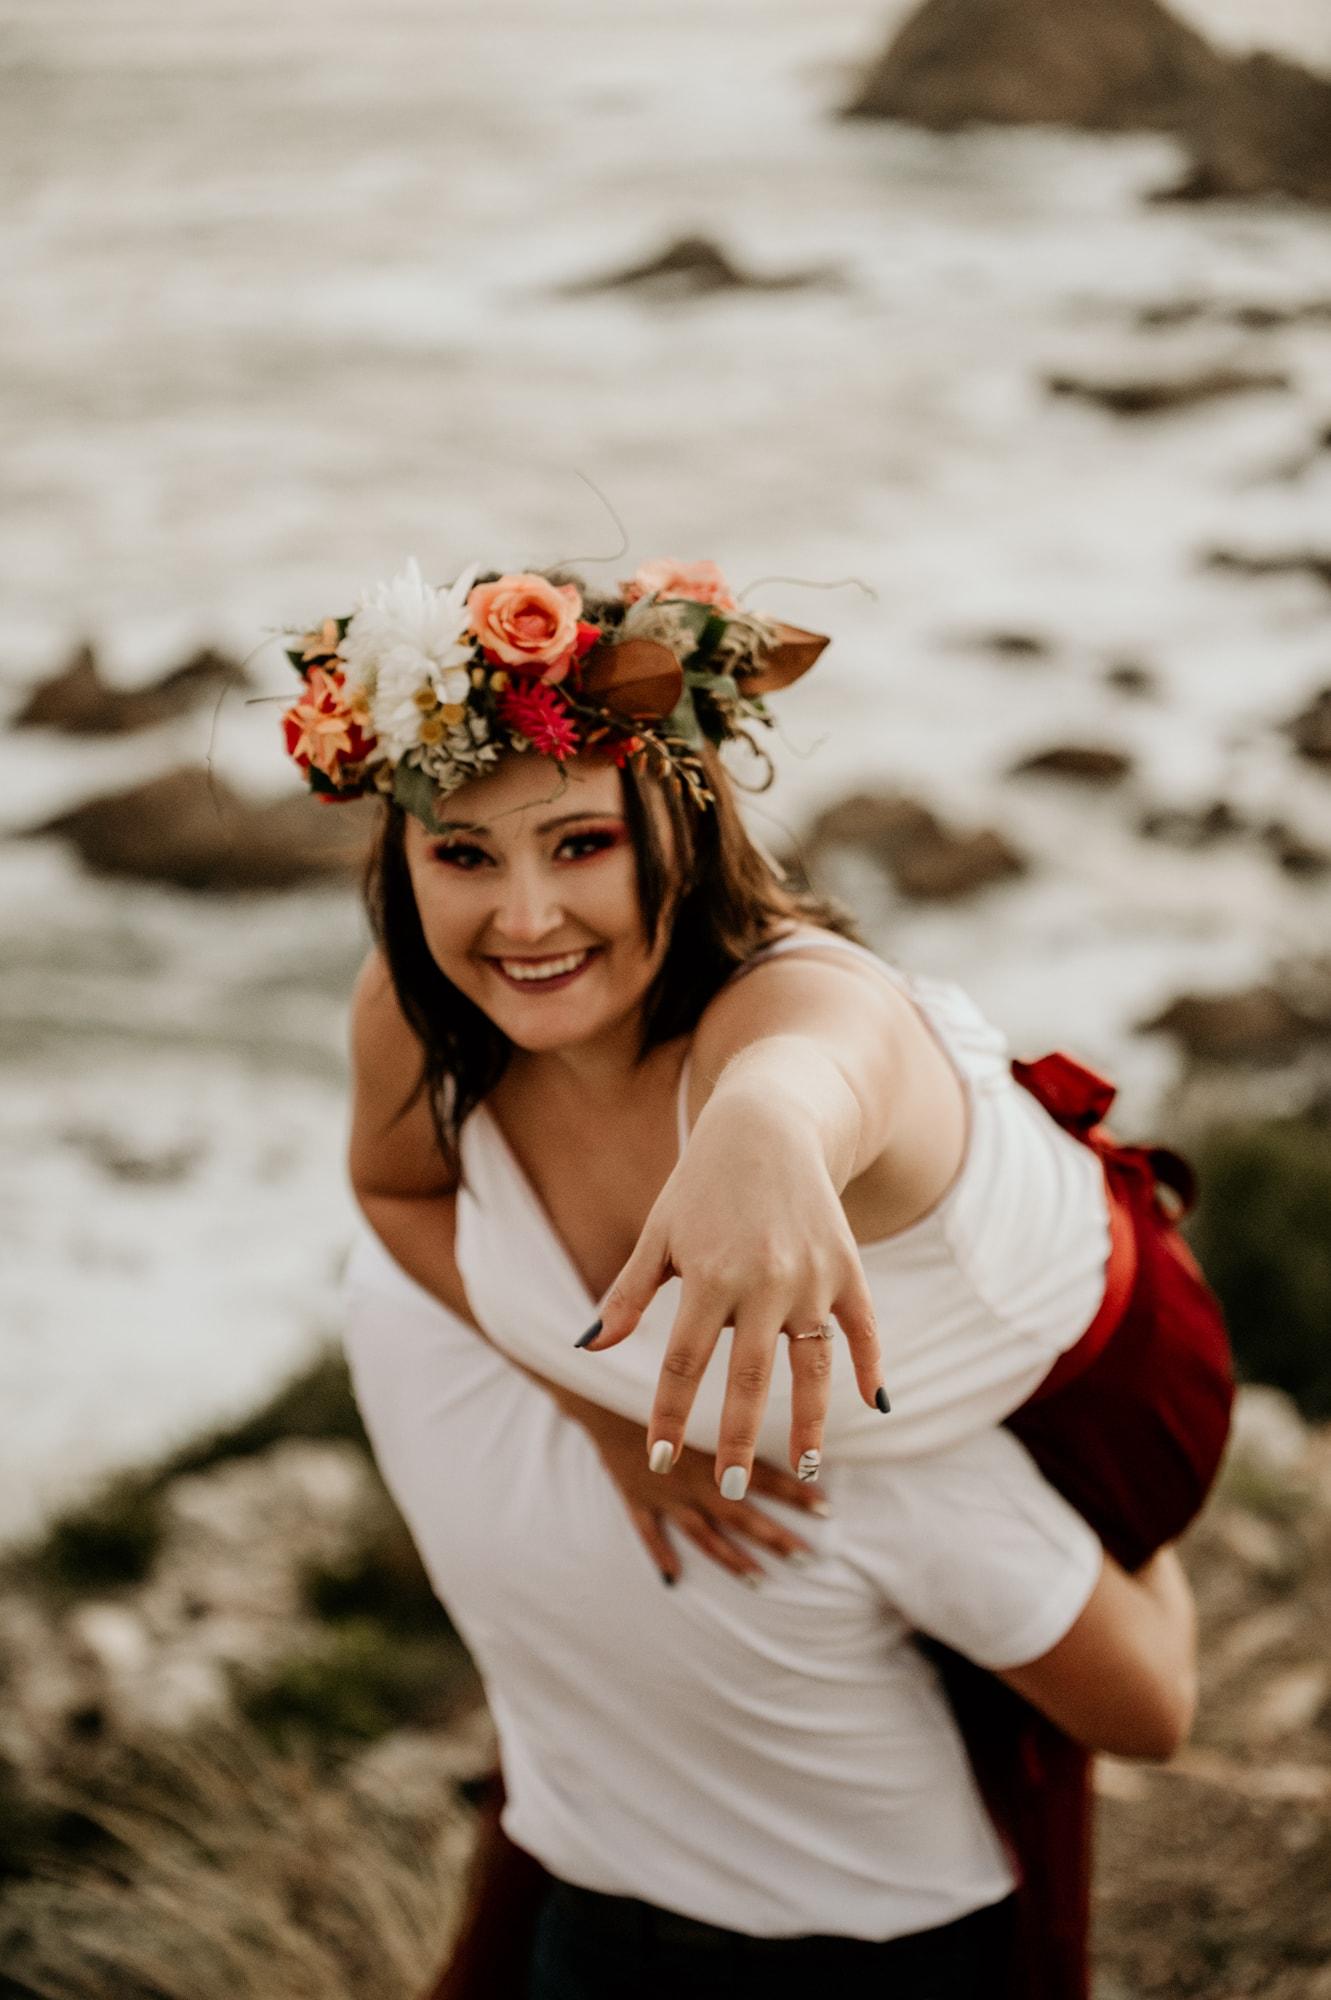 jesann-freddie-kranshoek-engagement-June-Richards-Photography-Destination-Weddings-Elopements-Garden-Route-04